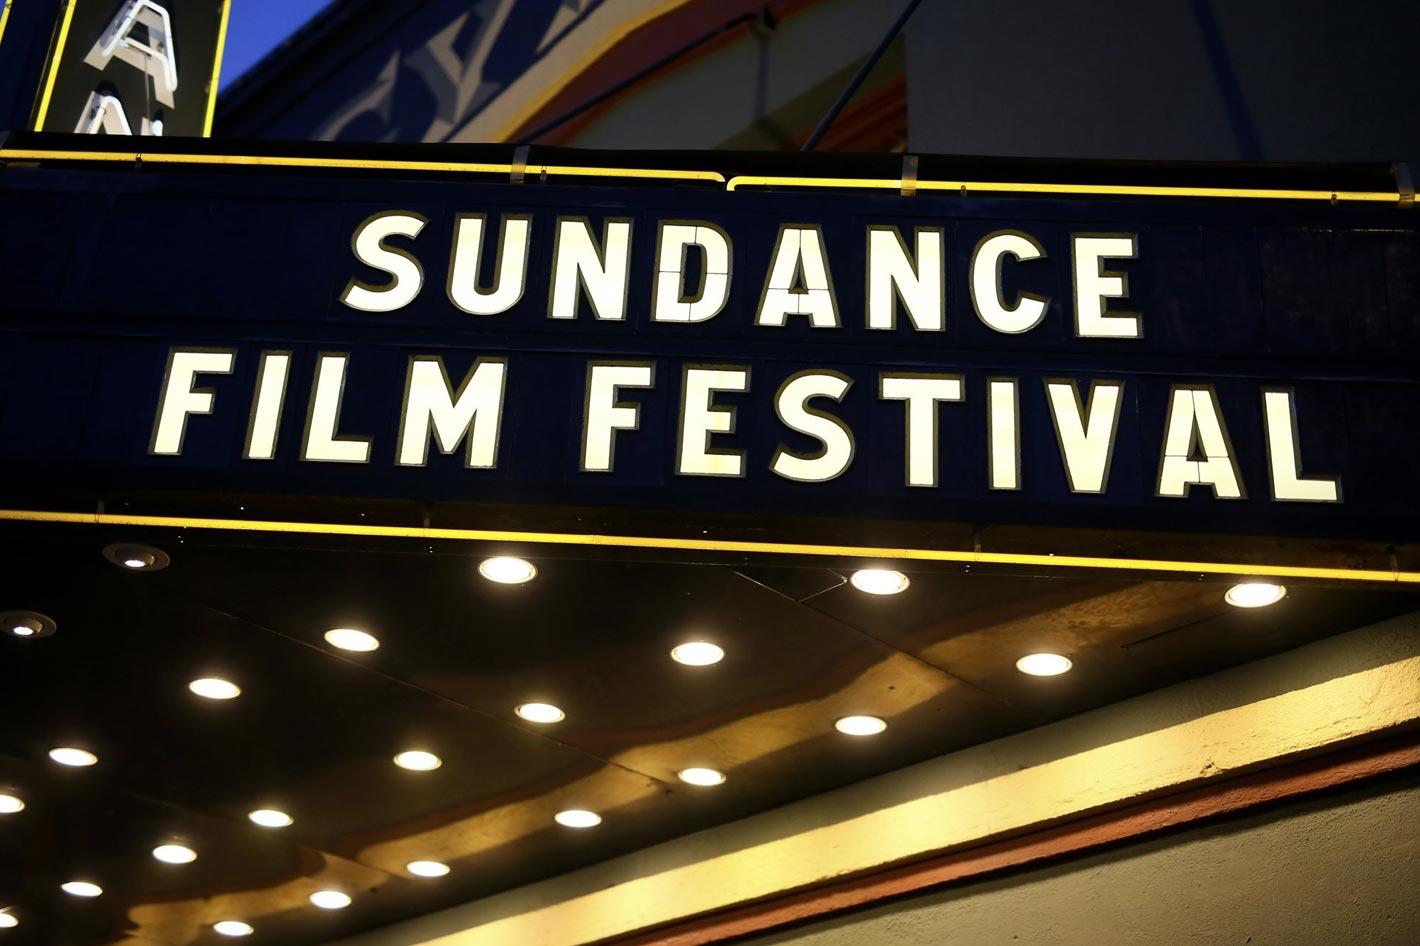 2021 Sundance Film Festival goes online and through a network of cinemas